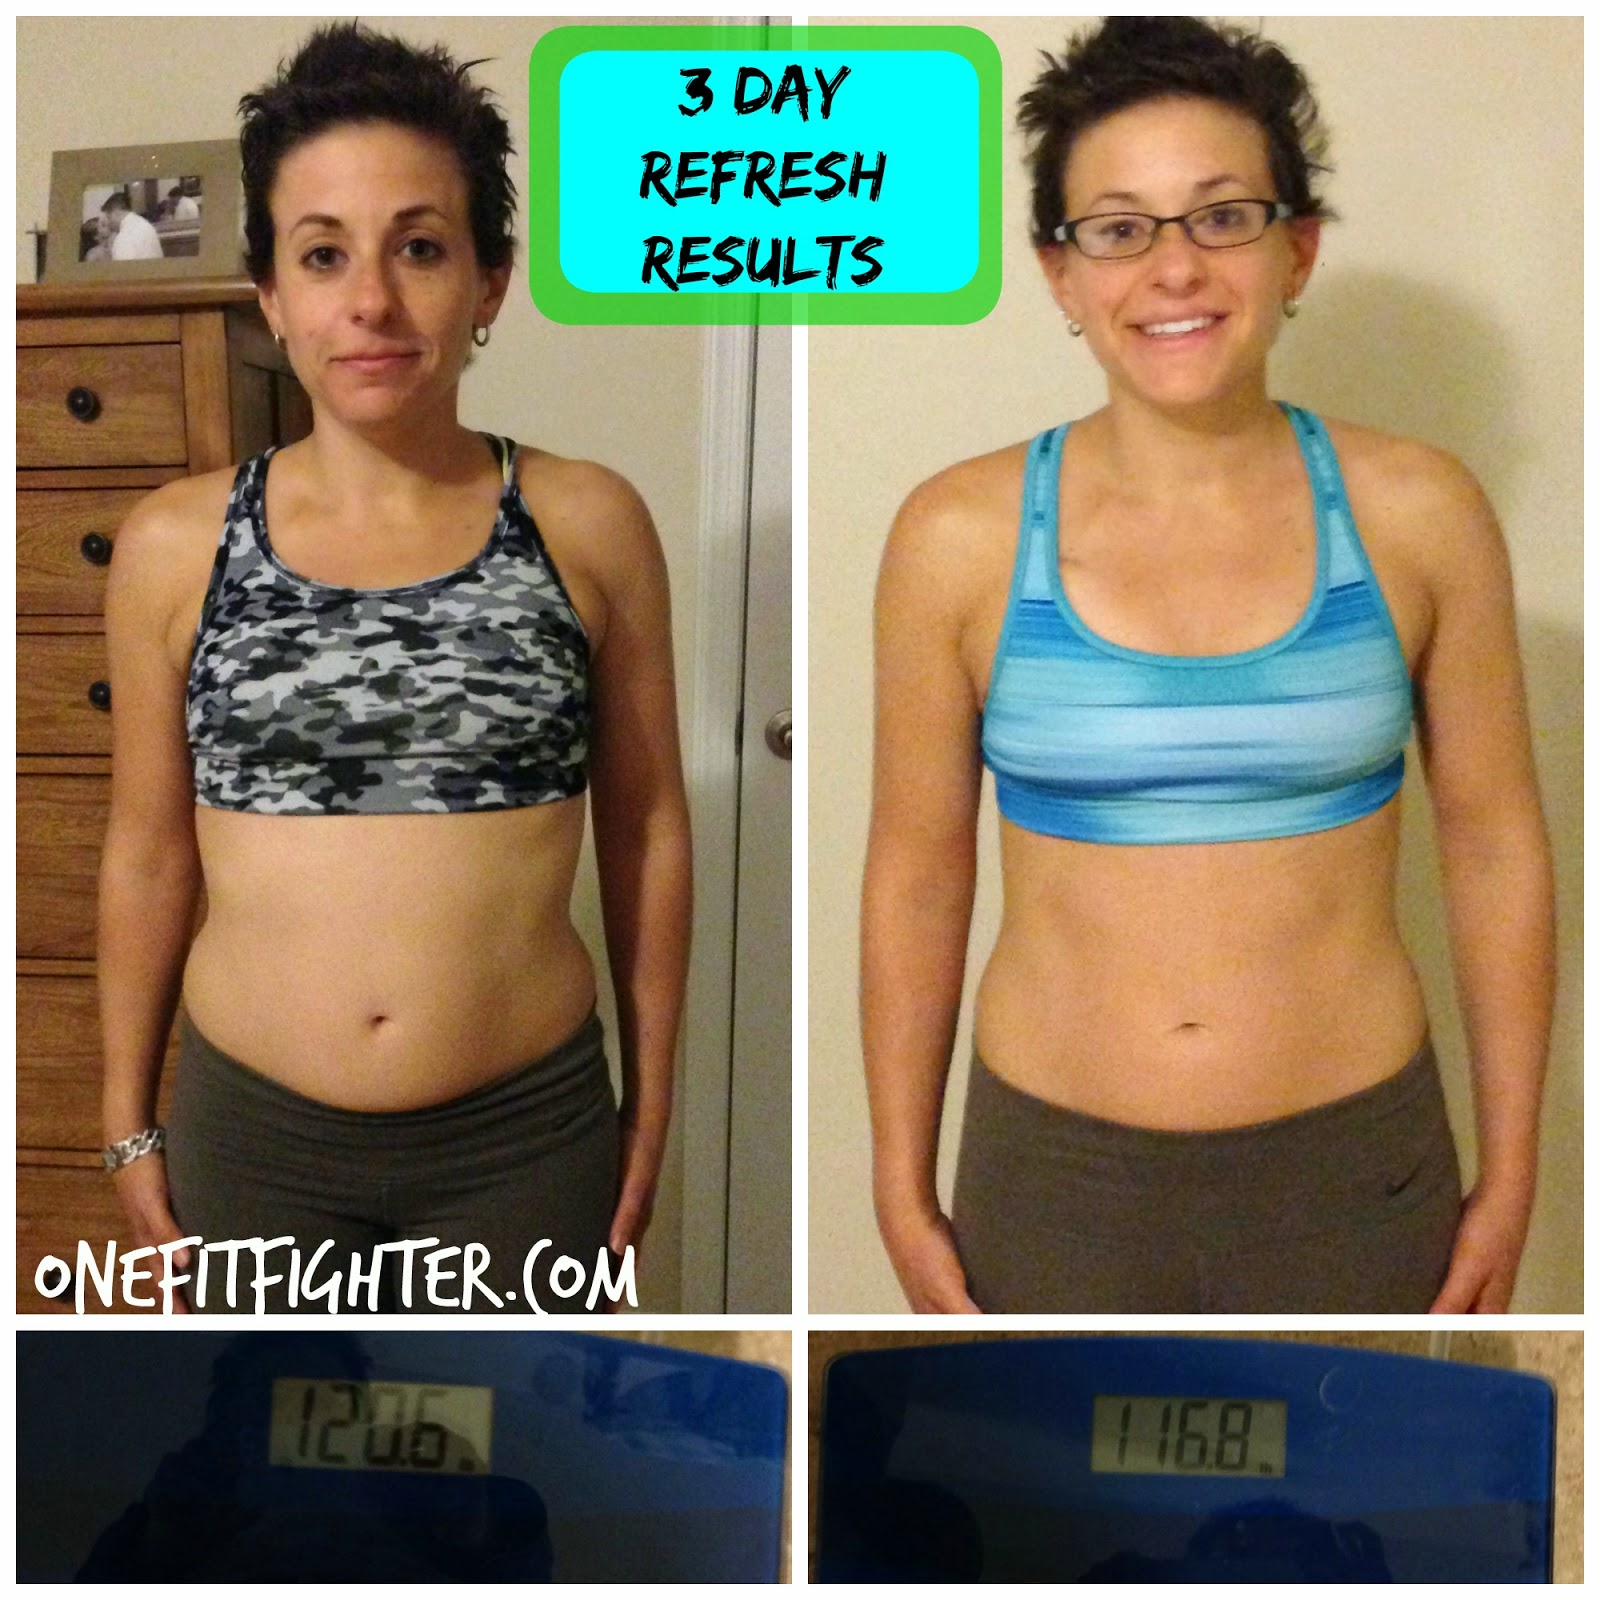 3 day refresh results, 3 day refresh, beachbody transformation